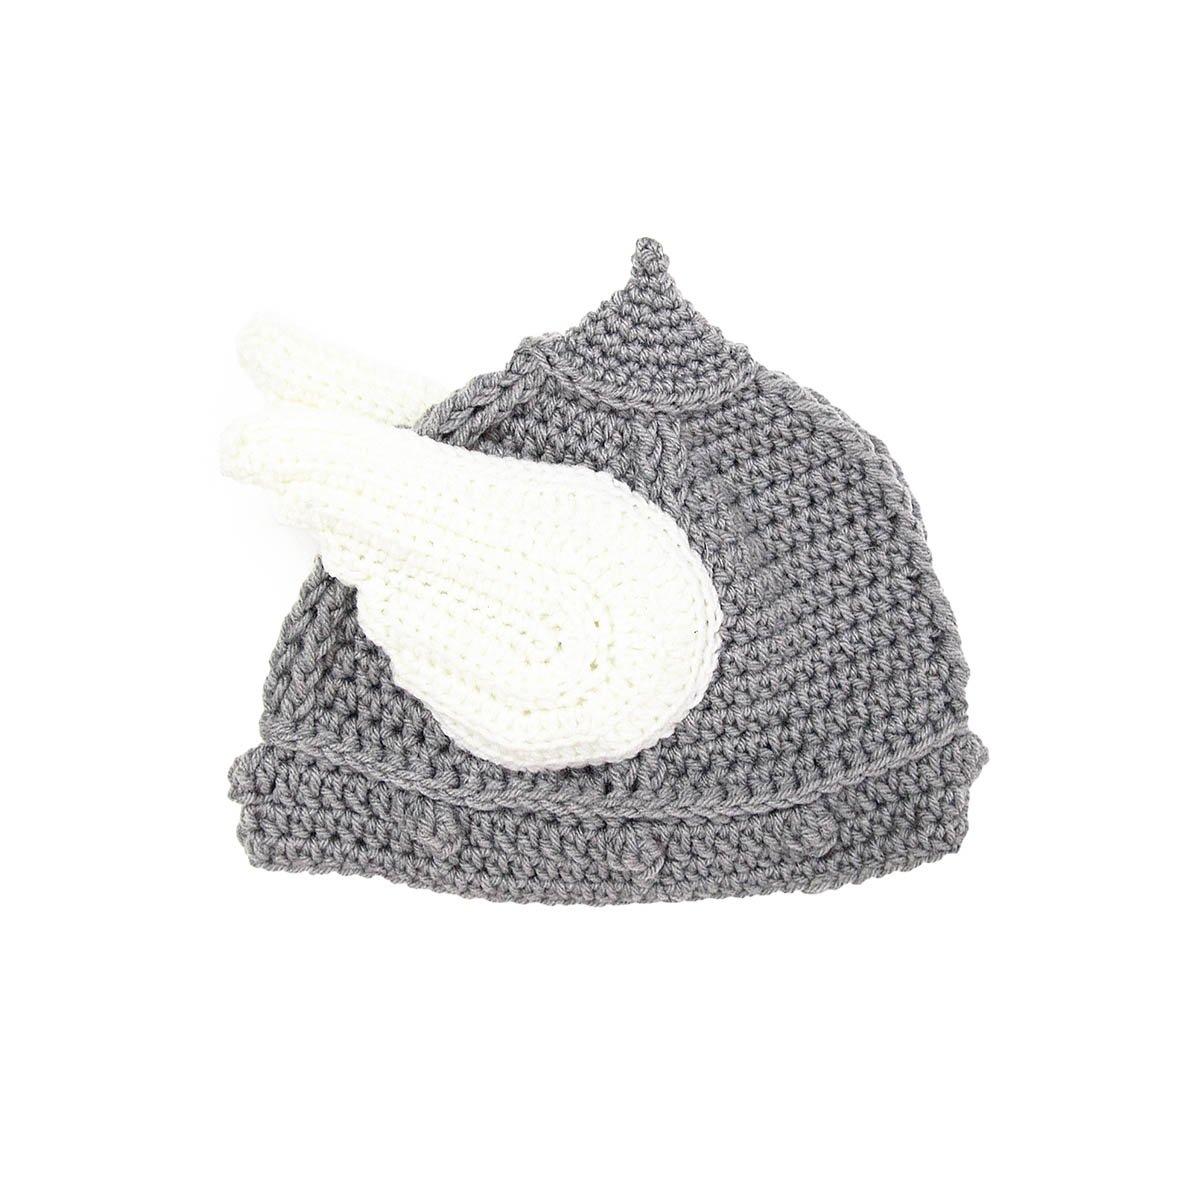 Amazon.com: Beard Head - The Original Barbarian Thor Knit Beard Hat (Black): Clothing